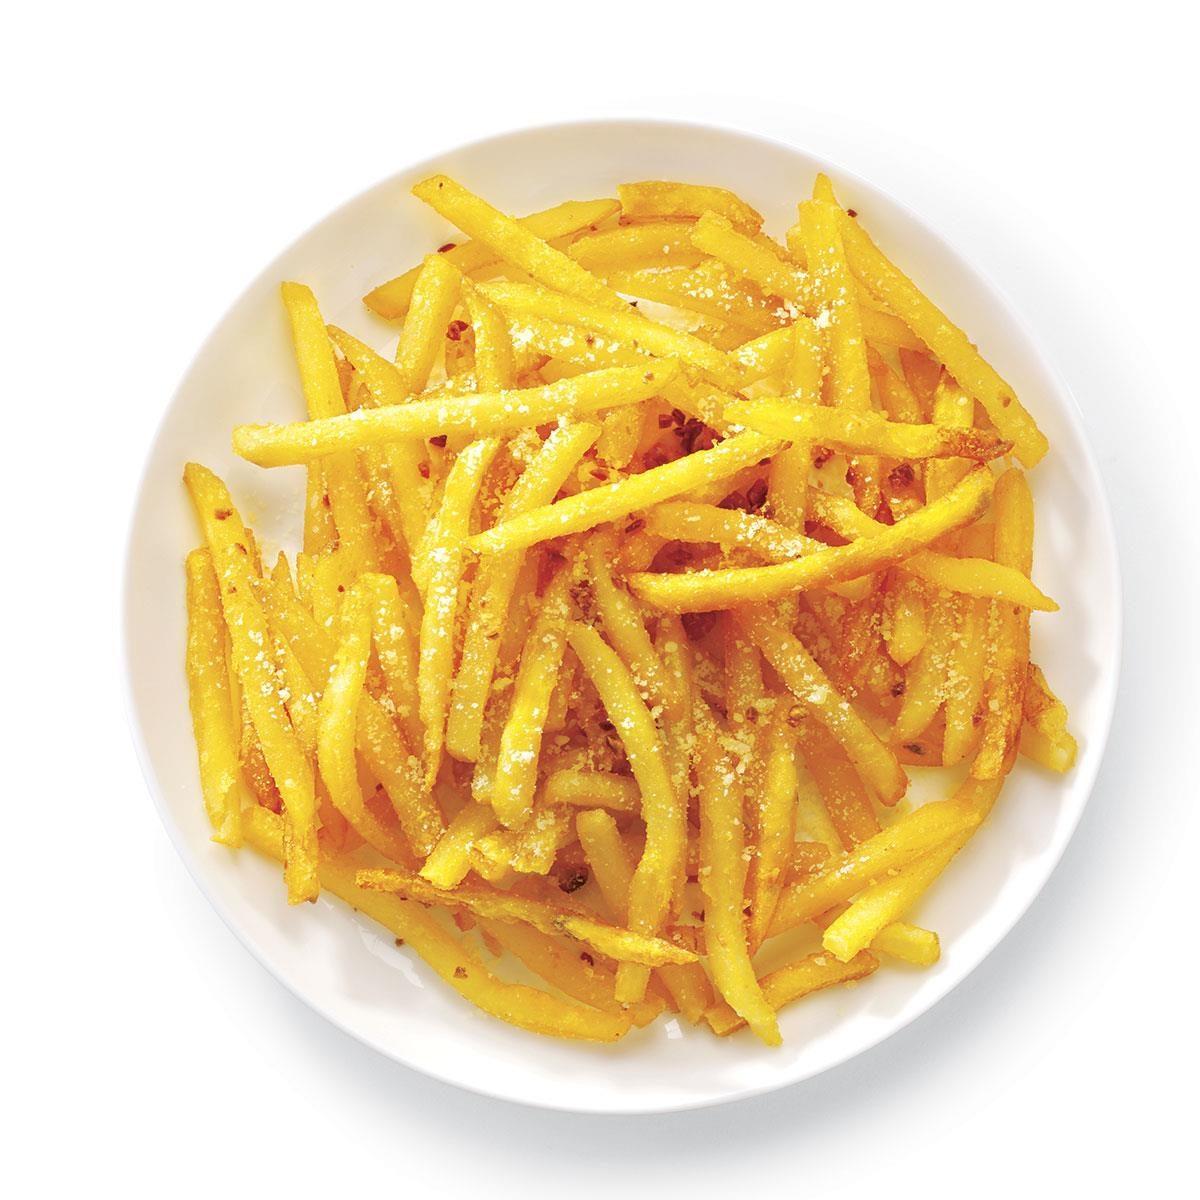 parmesean garlic fries